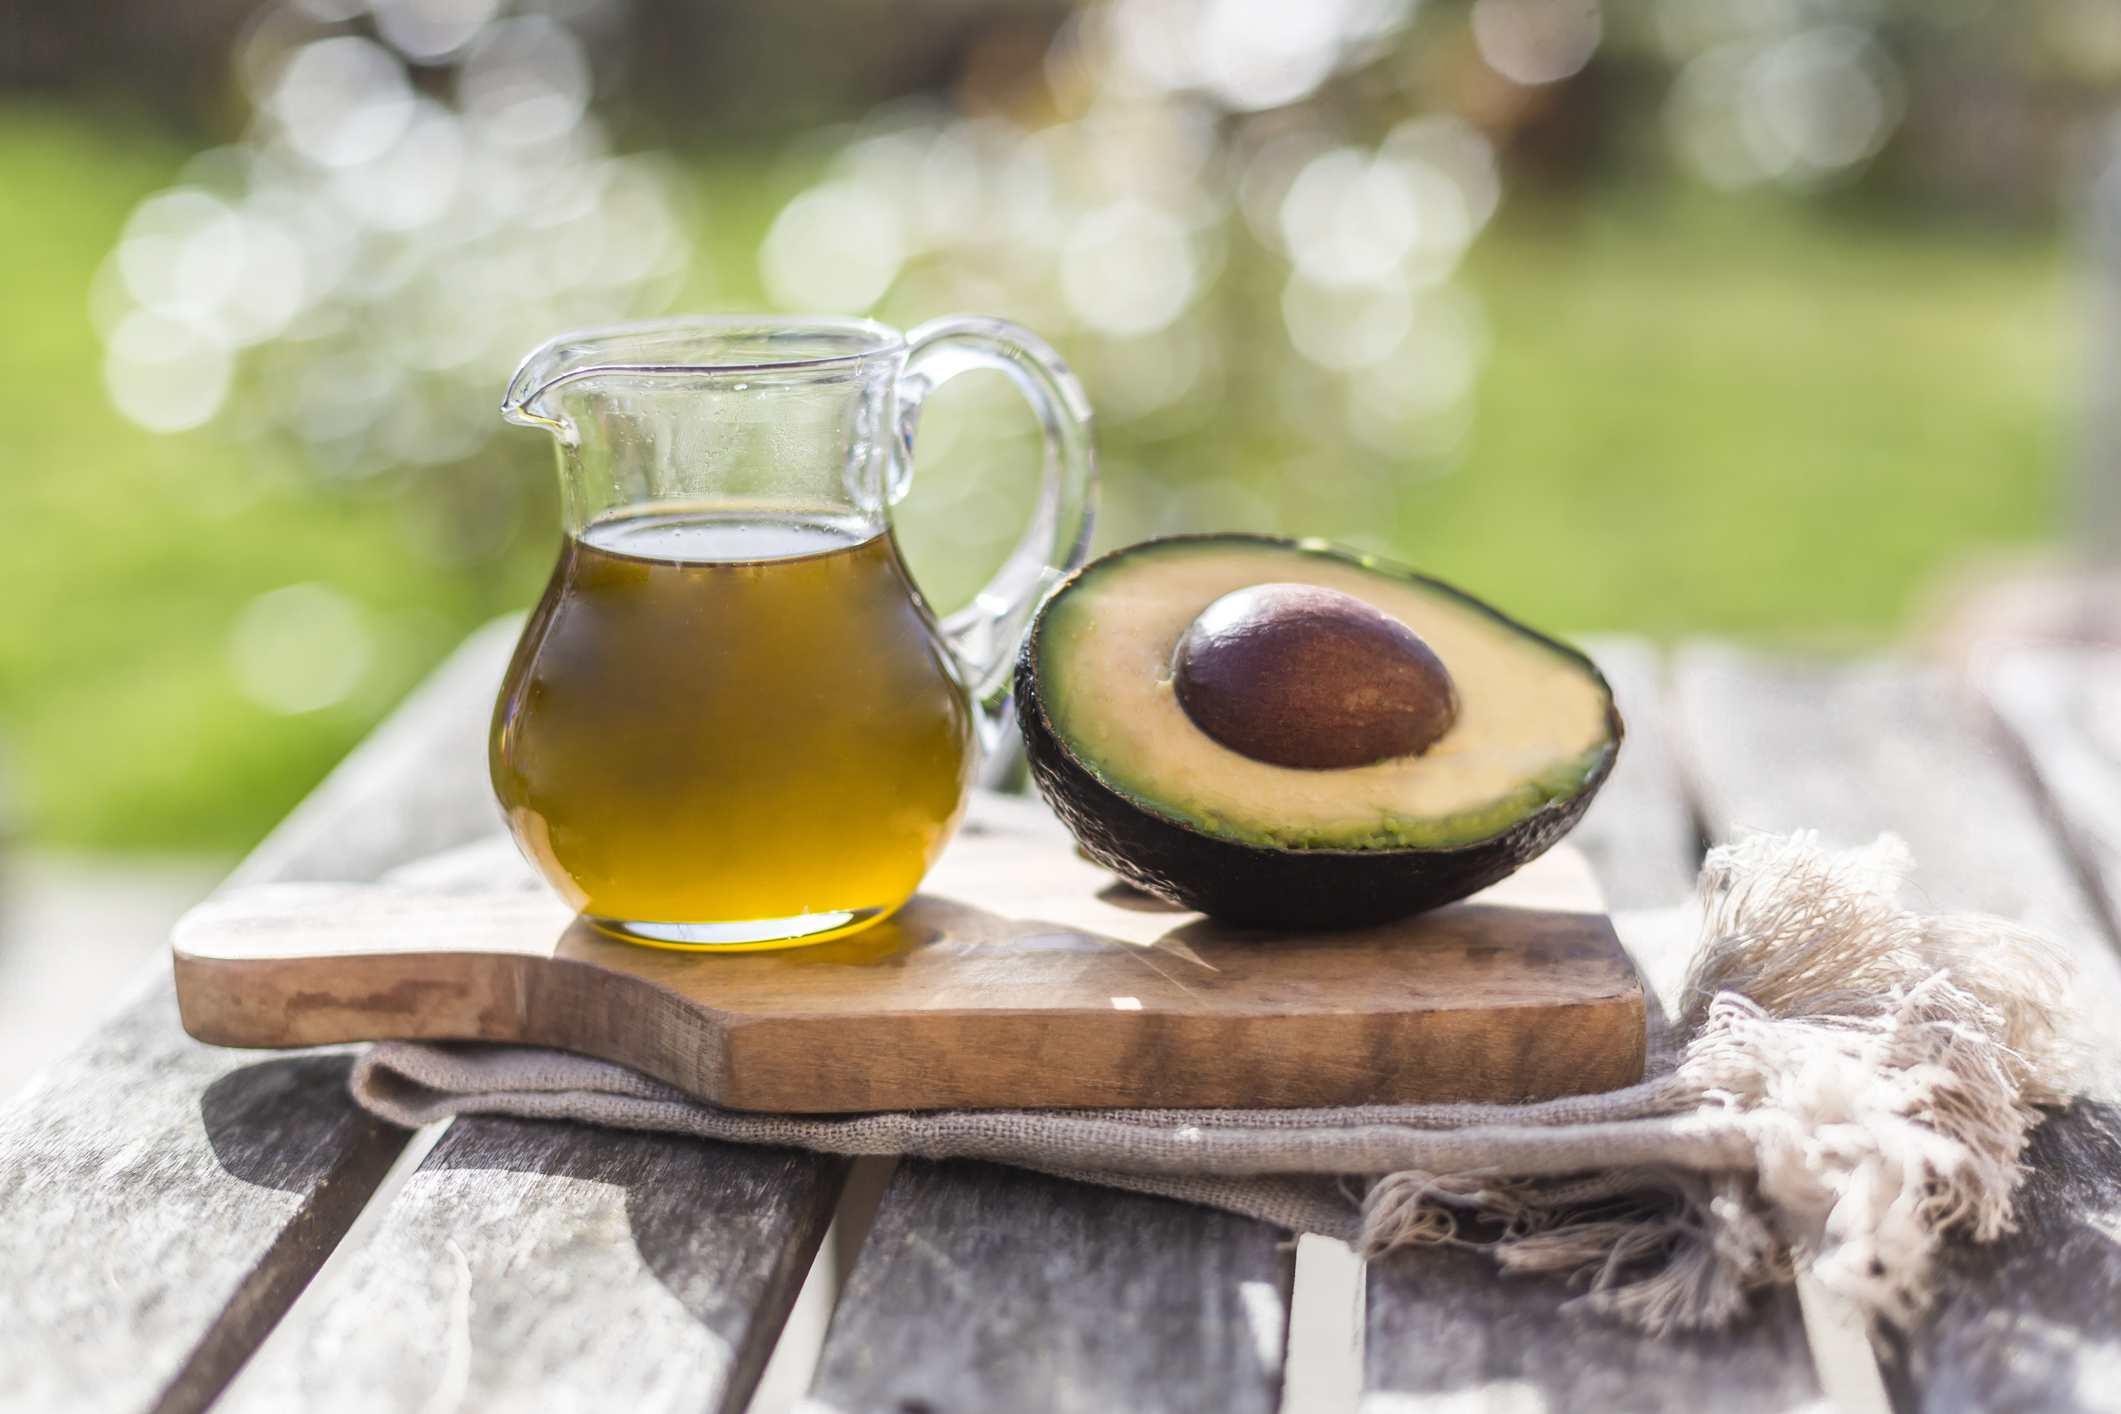 Avocado oil on cutting board next to halved avocado